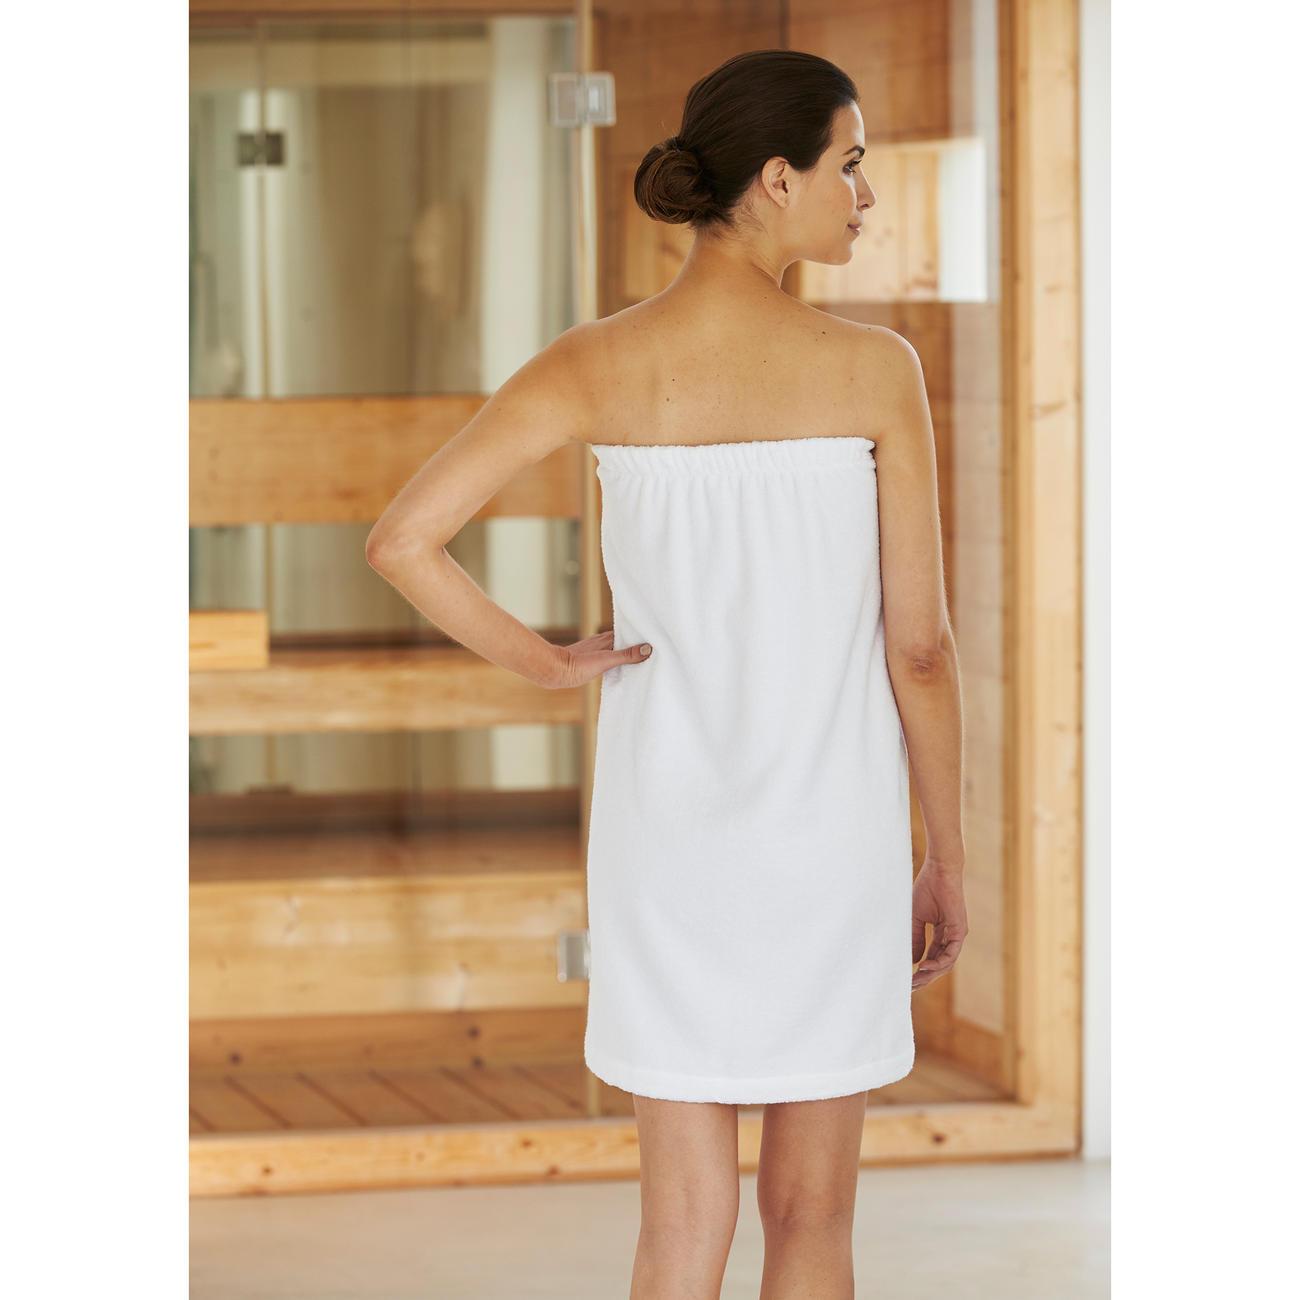 taubert sauna sarong mode klassiker entdecken. Black Bedroom Furniture Sets. Home Design Ideas